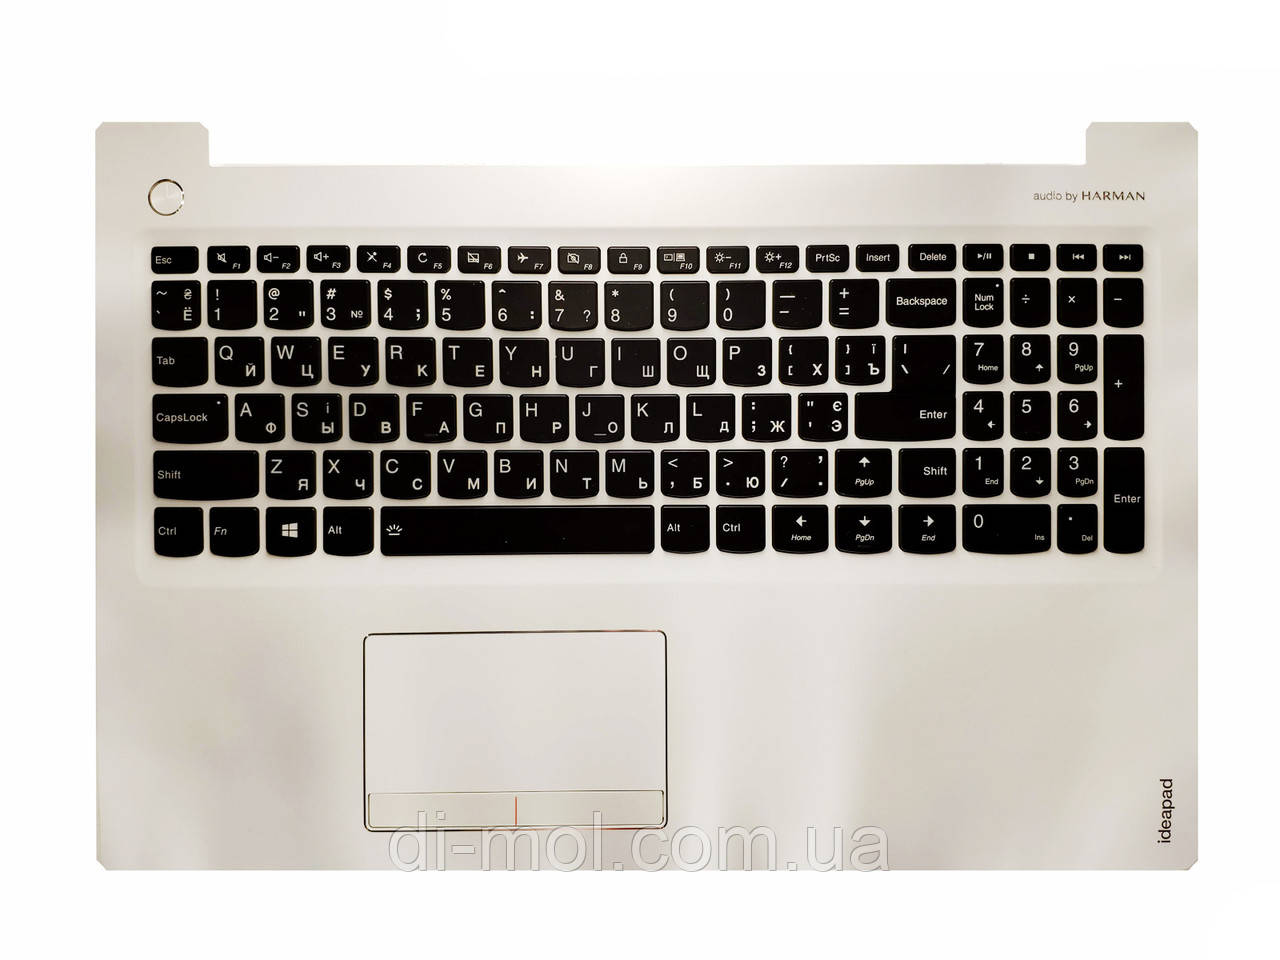 Оригинальная клавиатура для Lenovo IdeaPad 310-15, IdeaPad 510-15 series, black, ua, подсветка